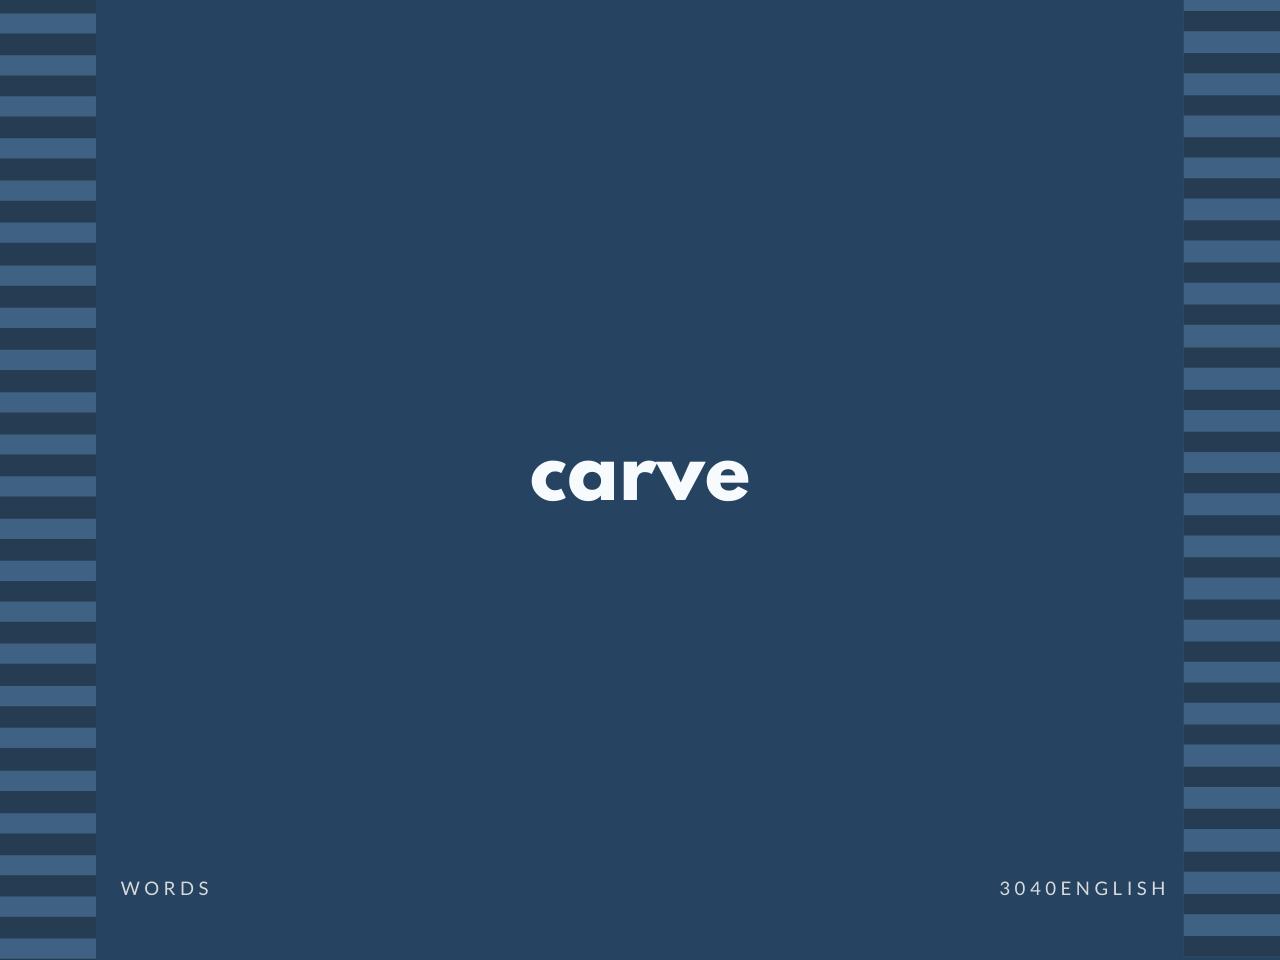 carve の意味と簡単な使い方【音読用例文あり】